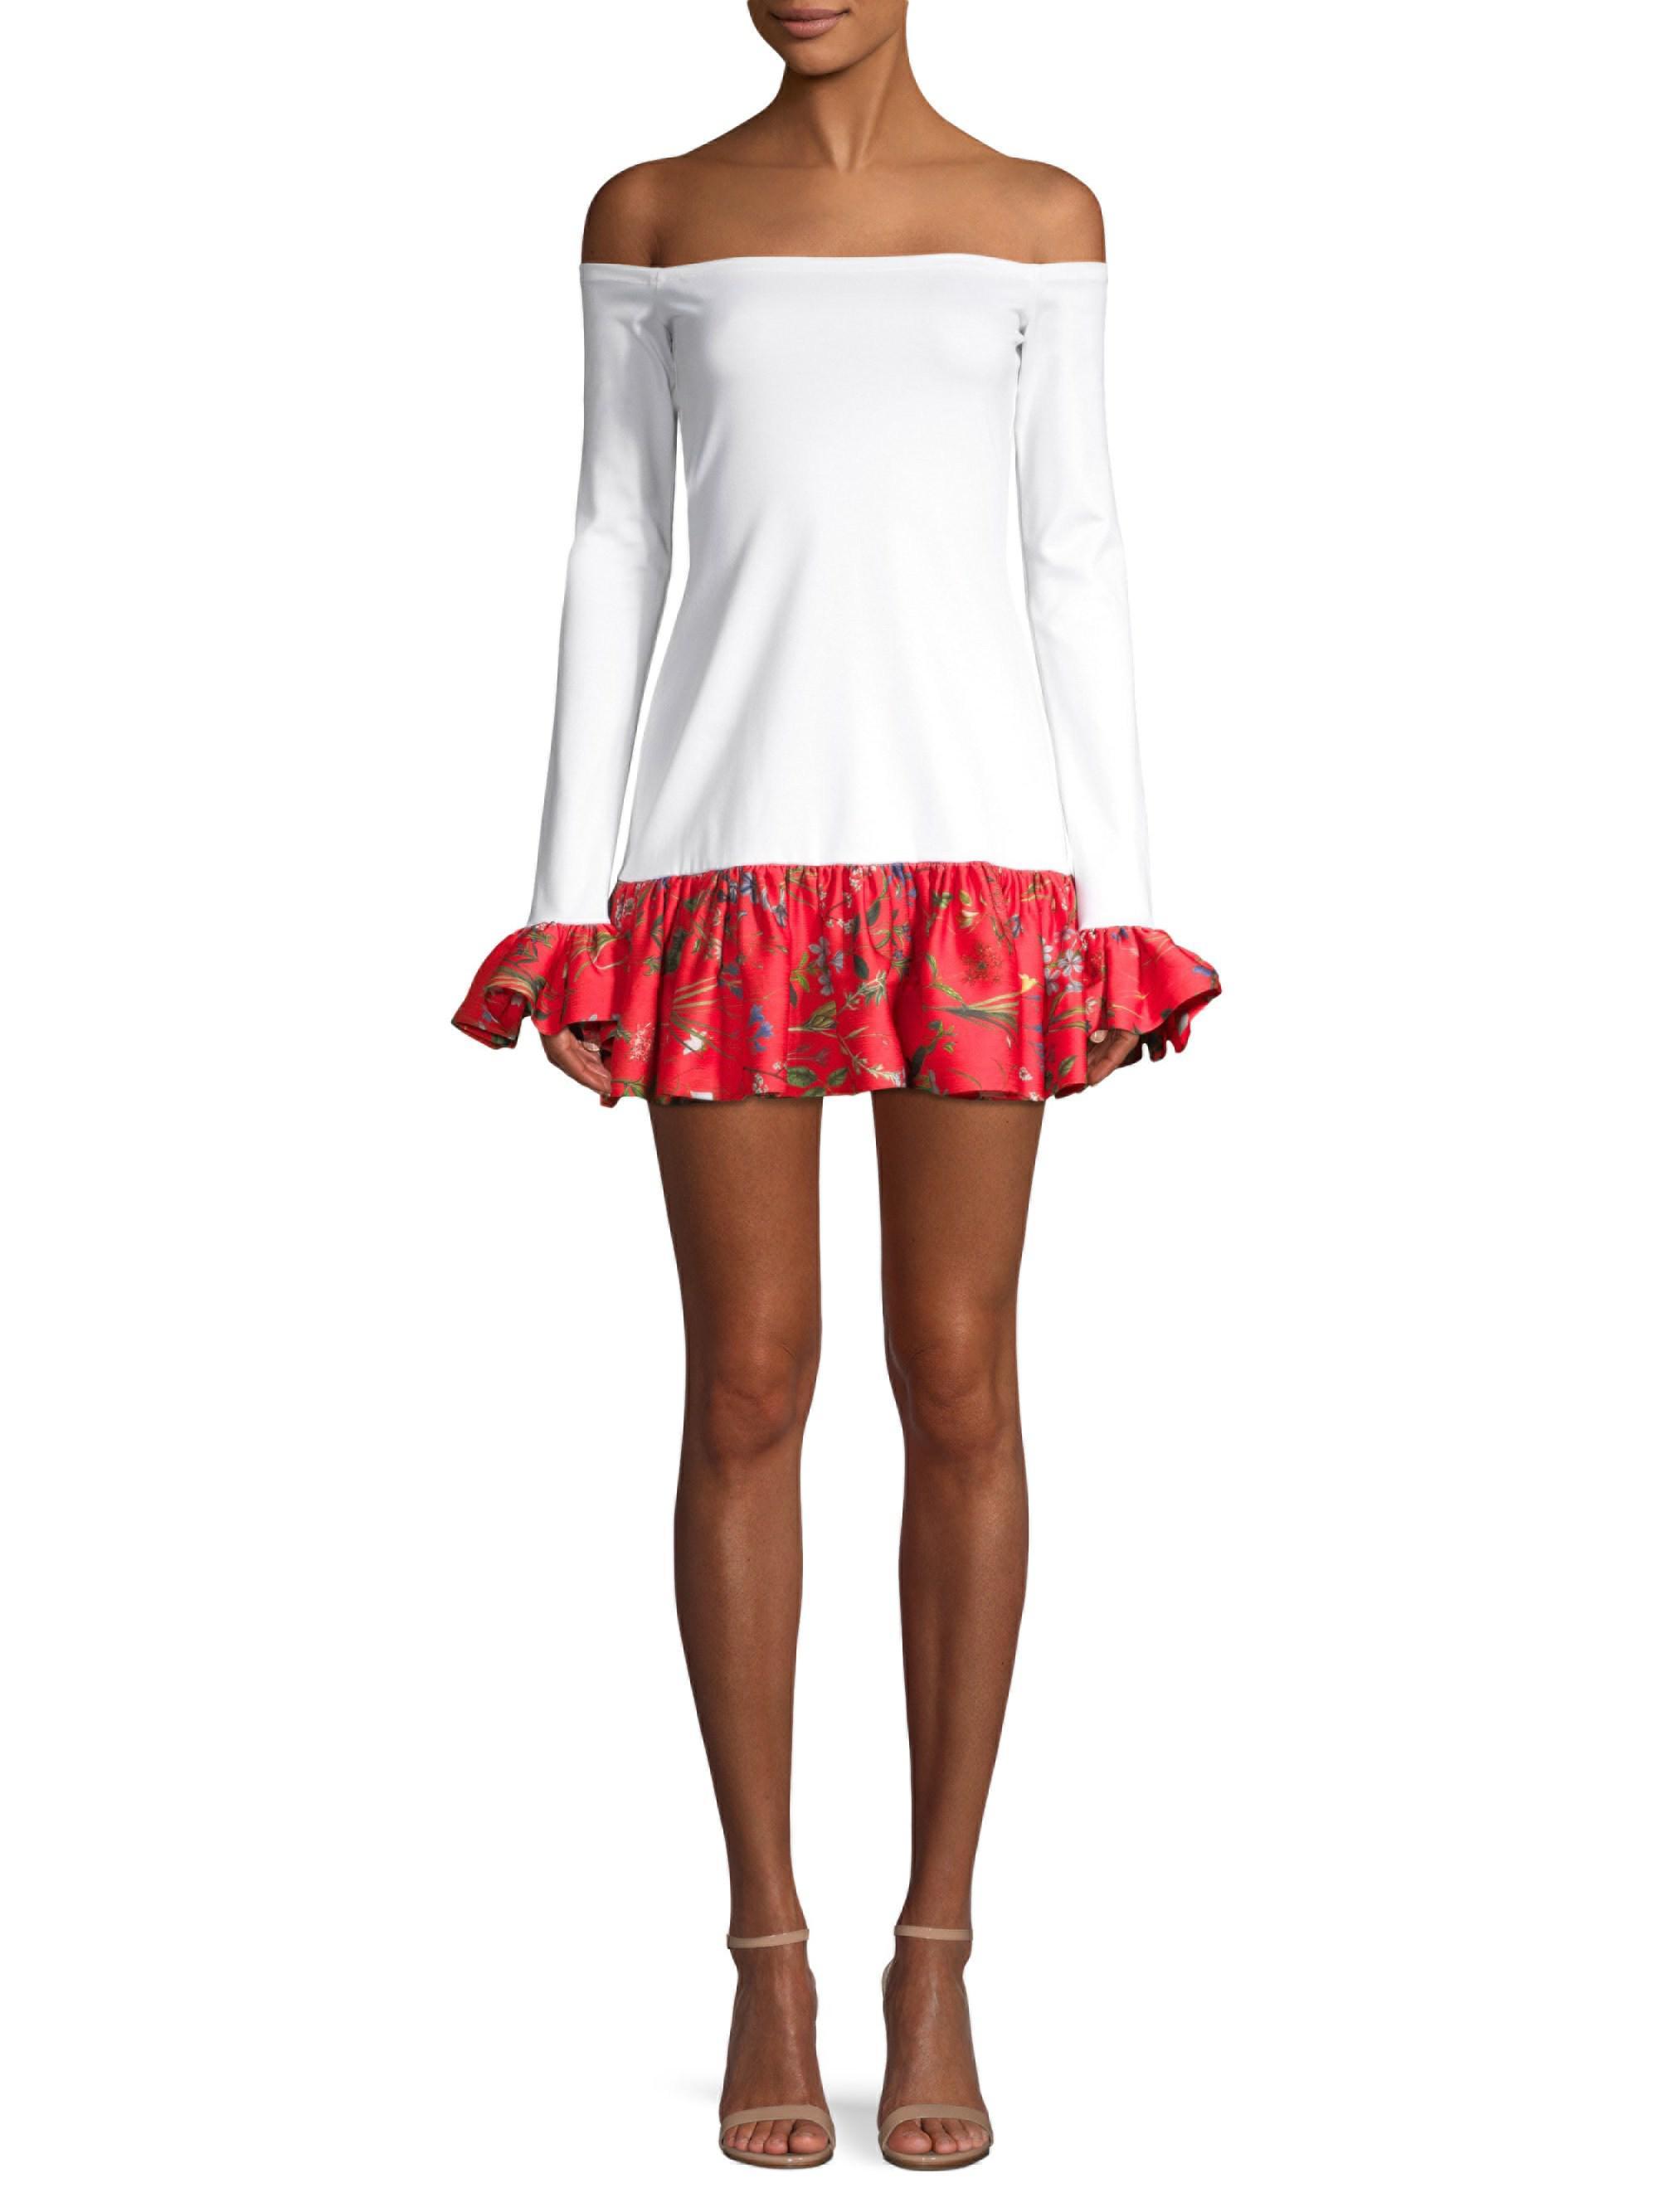 a08d5a15e4 alexis-botanical-red-Estelle-Off-the-shoulder-Bell-Sleeve-Dress.jpeg